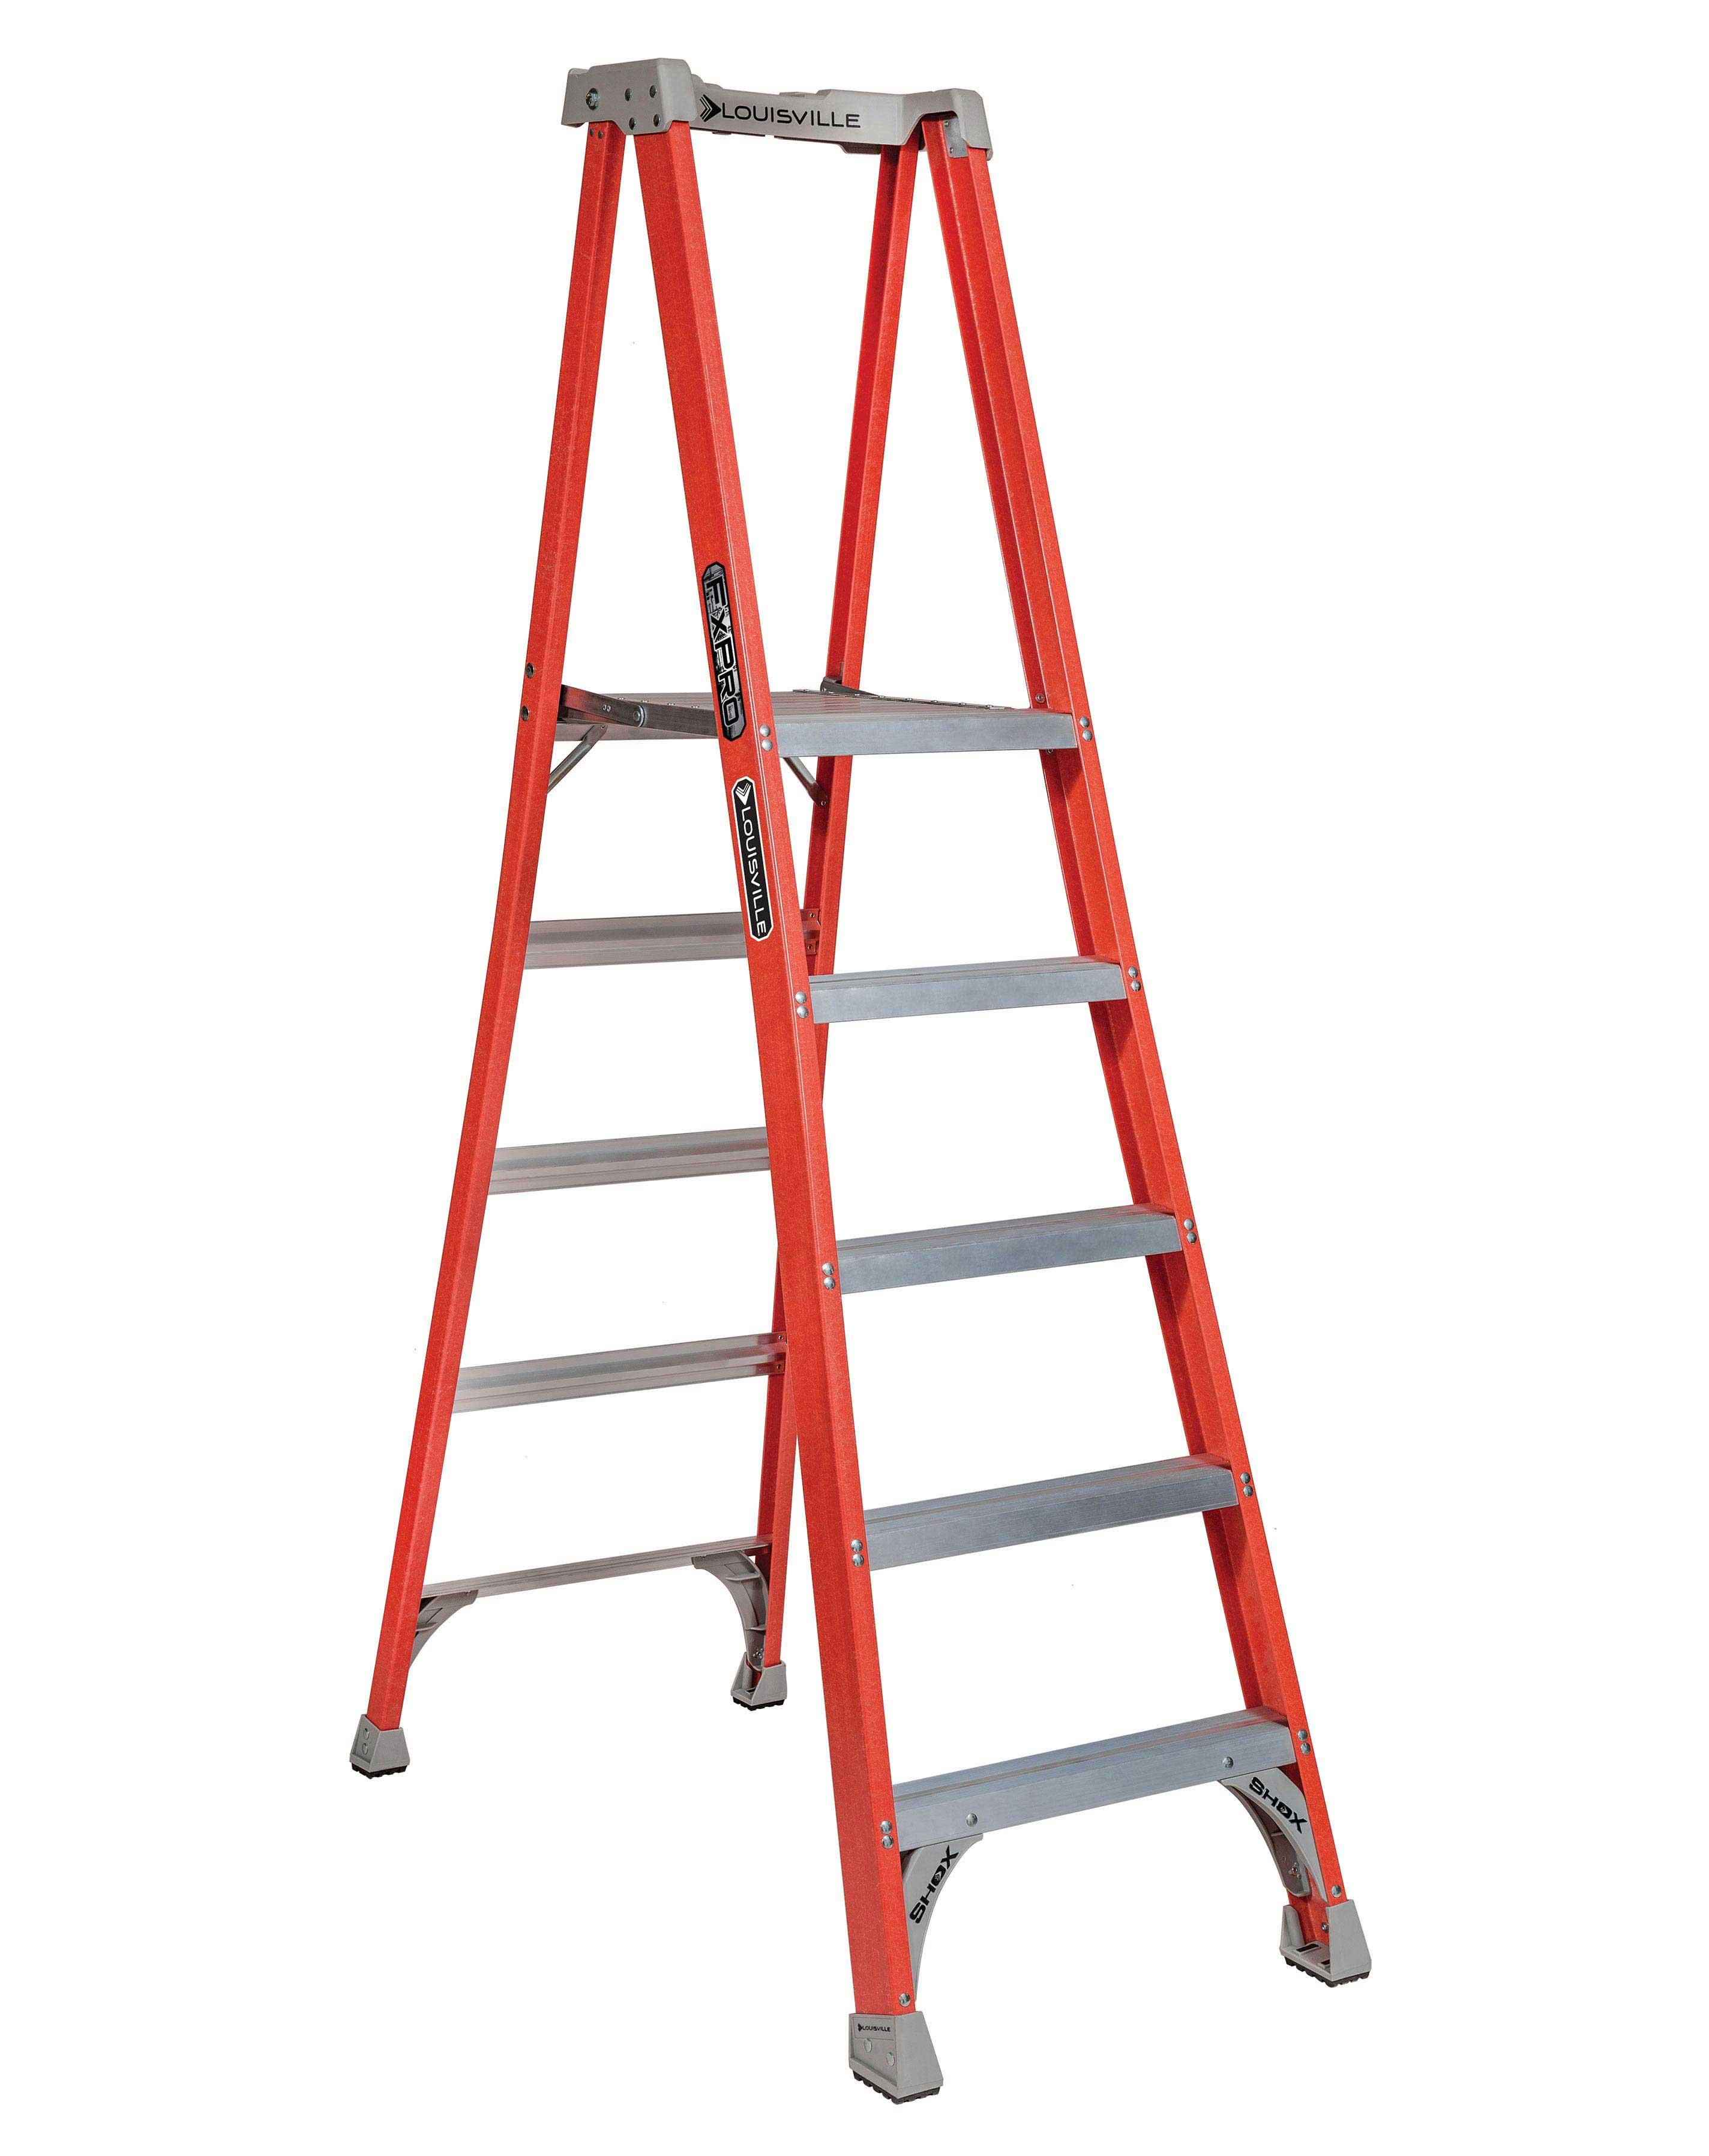 Louisville Ladder FXP1705 5ft Fiberglass Platform Ladder, Type IA, 300lb Load Capacity